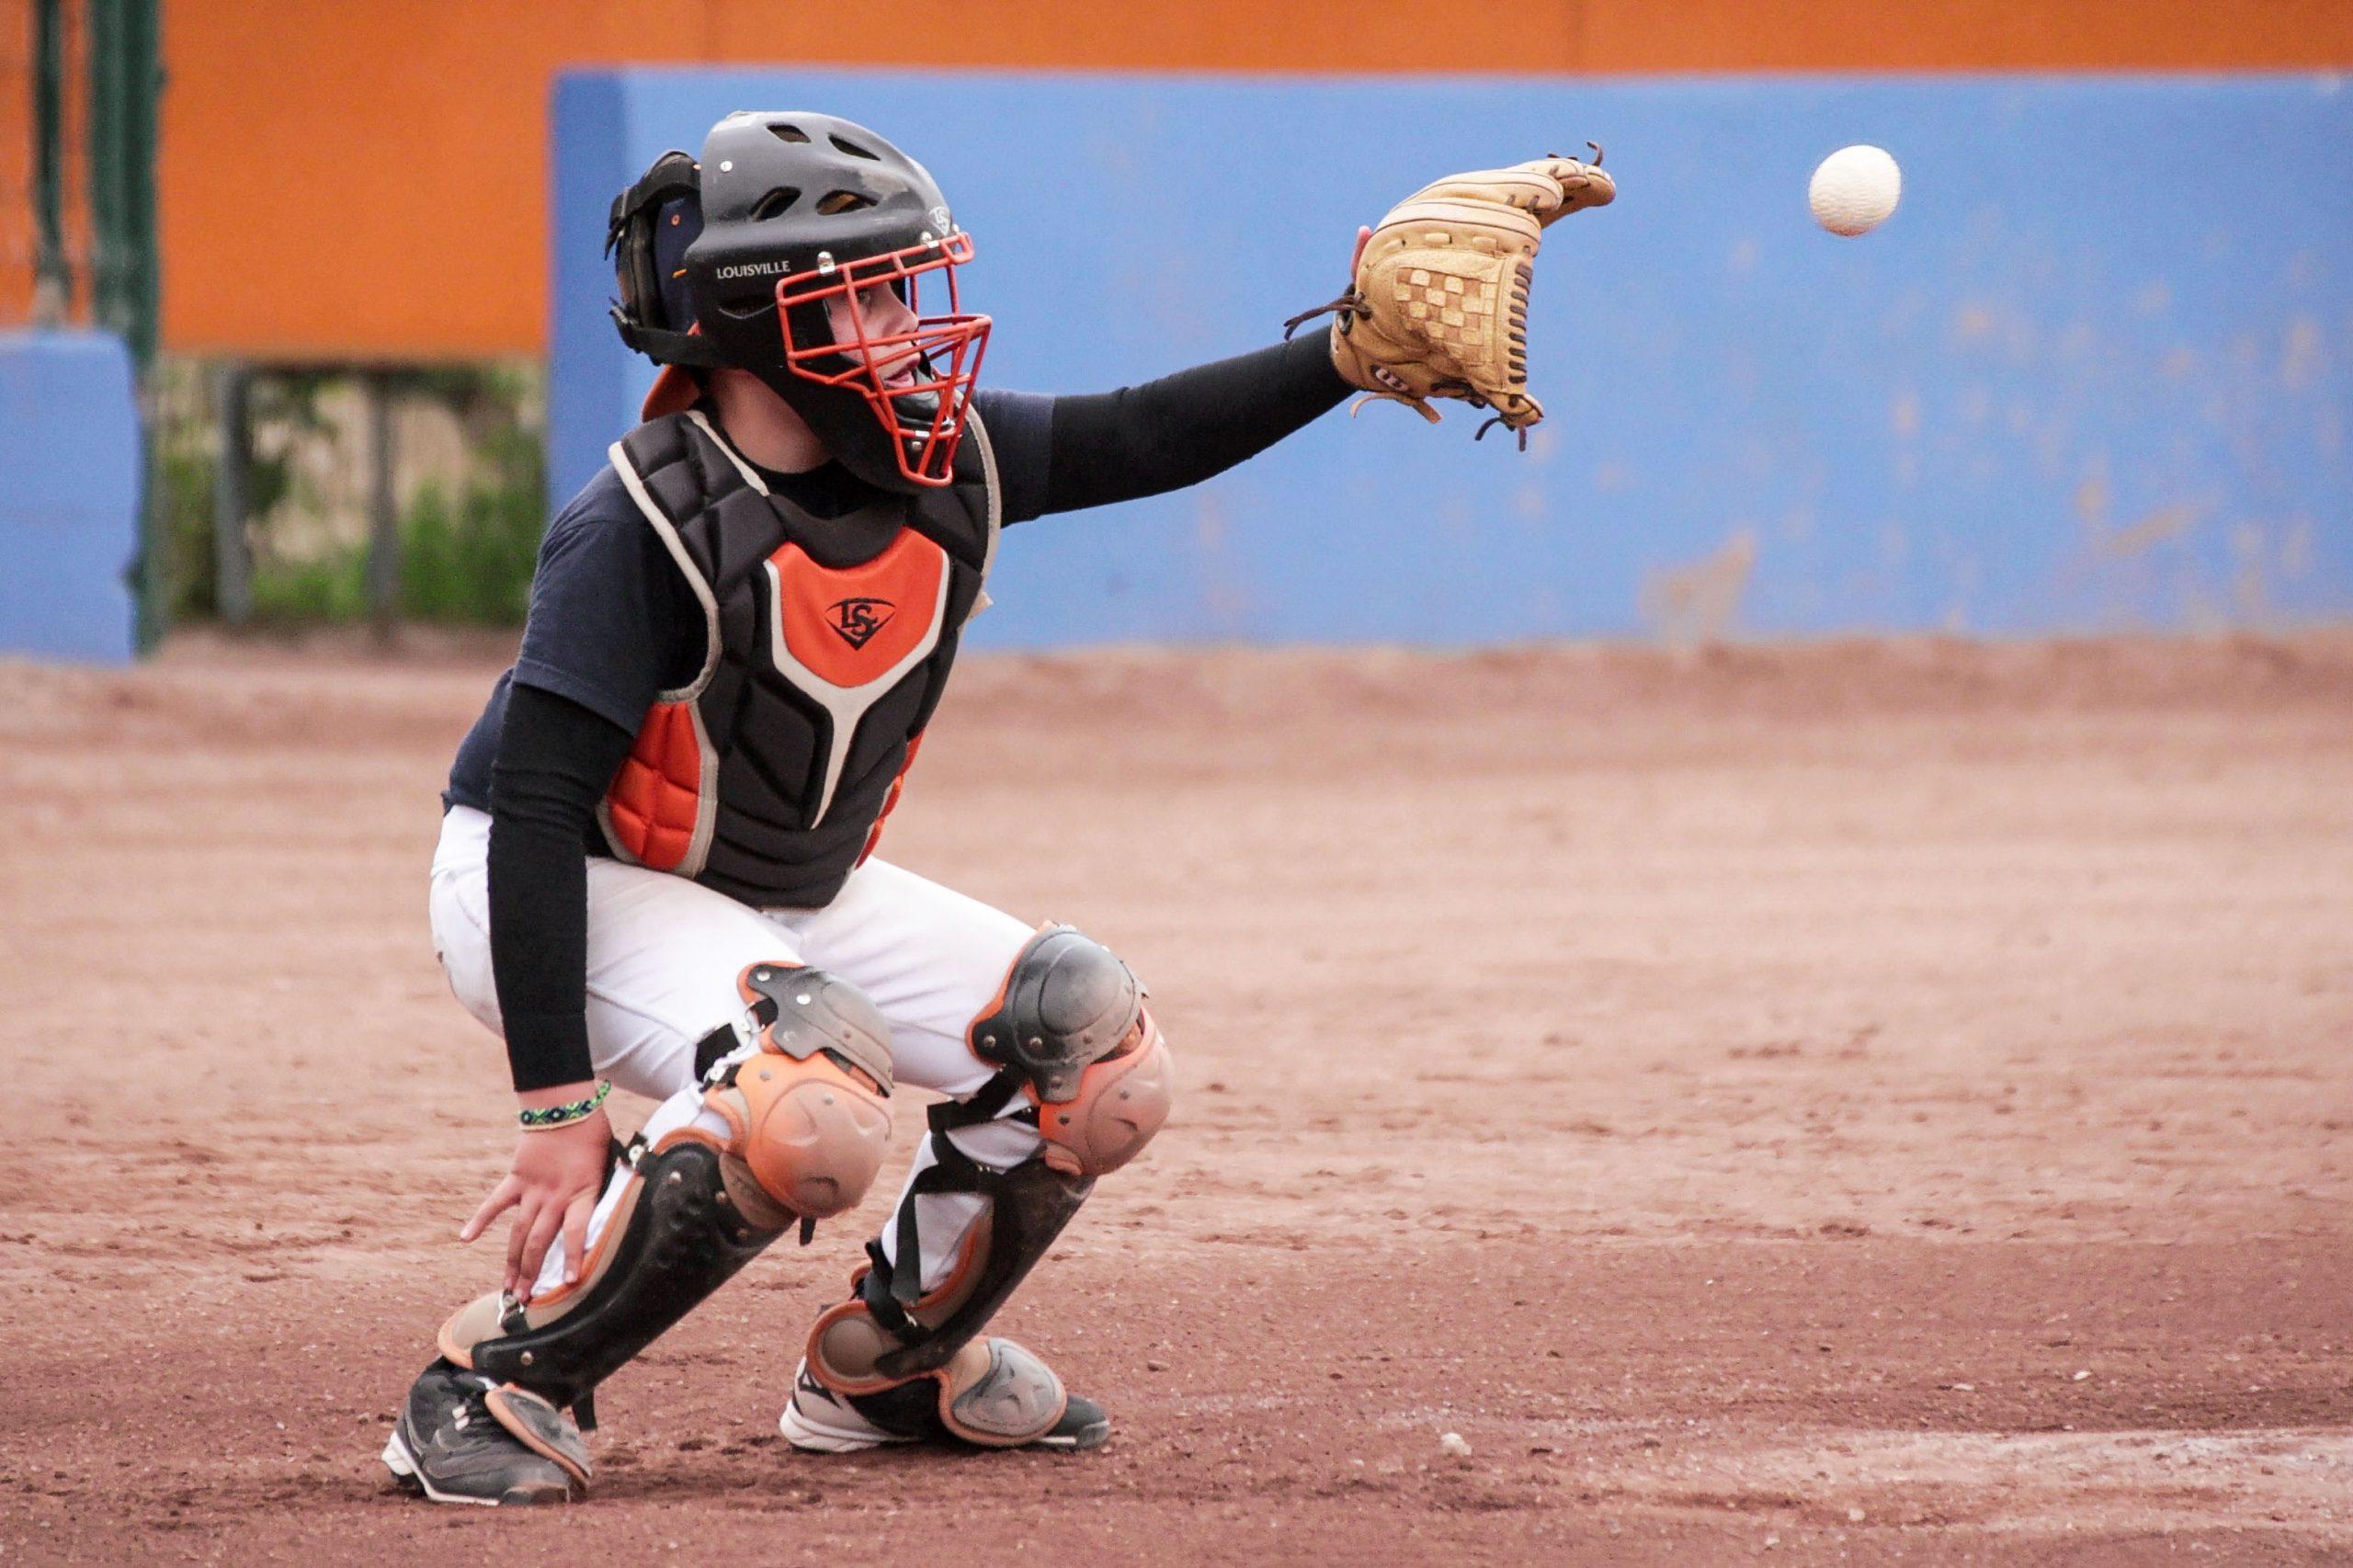 Photograph of a baseball player, Alexandre Juskewycz